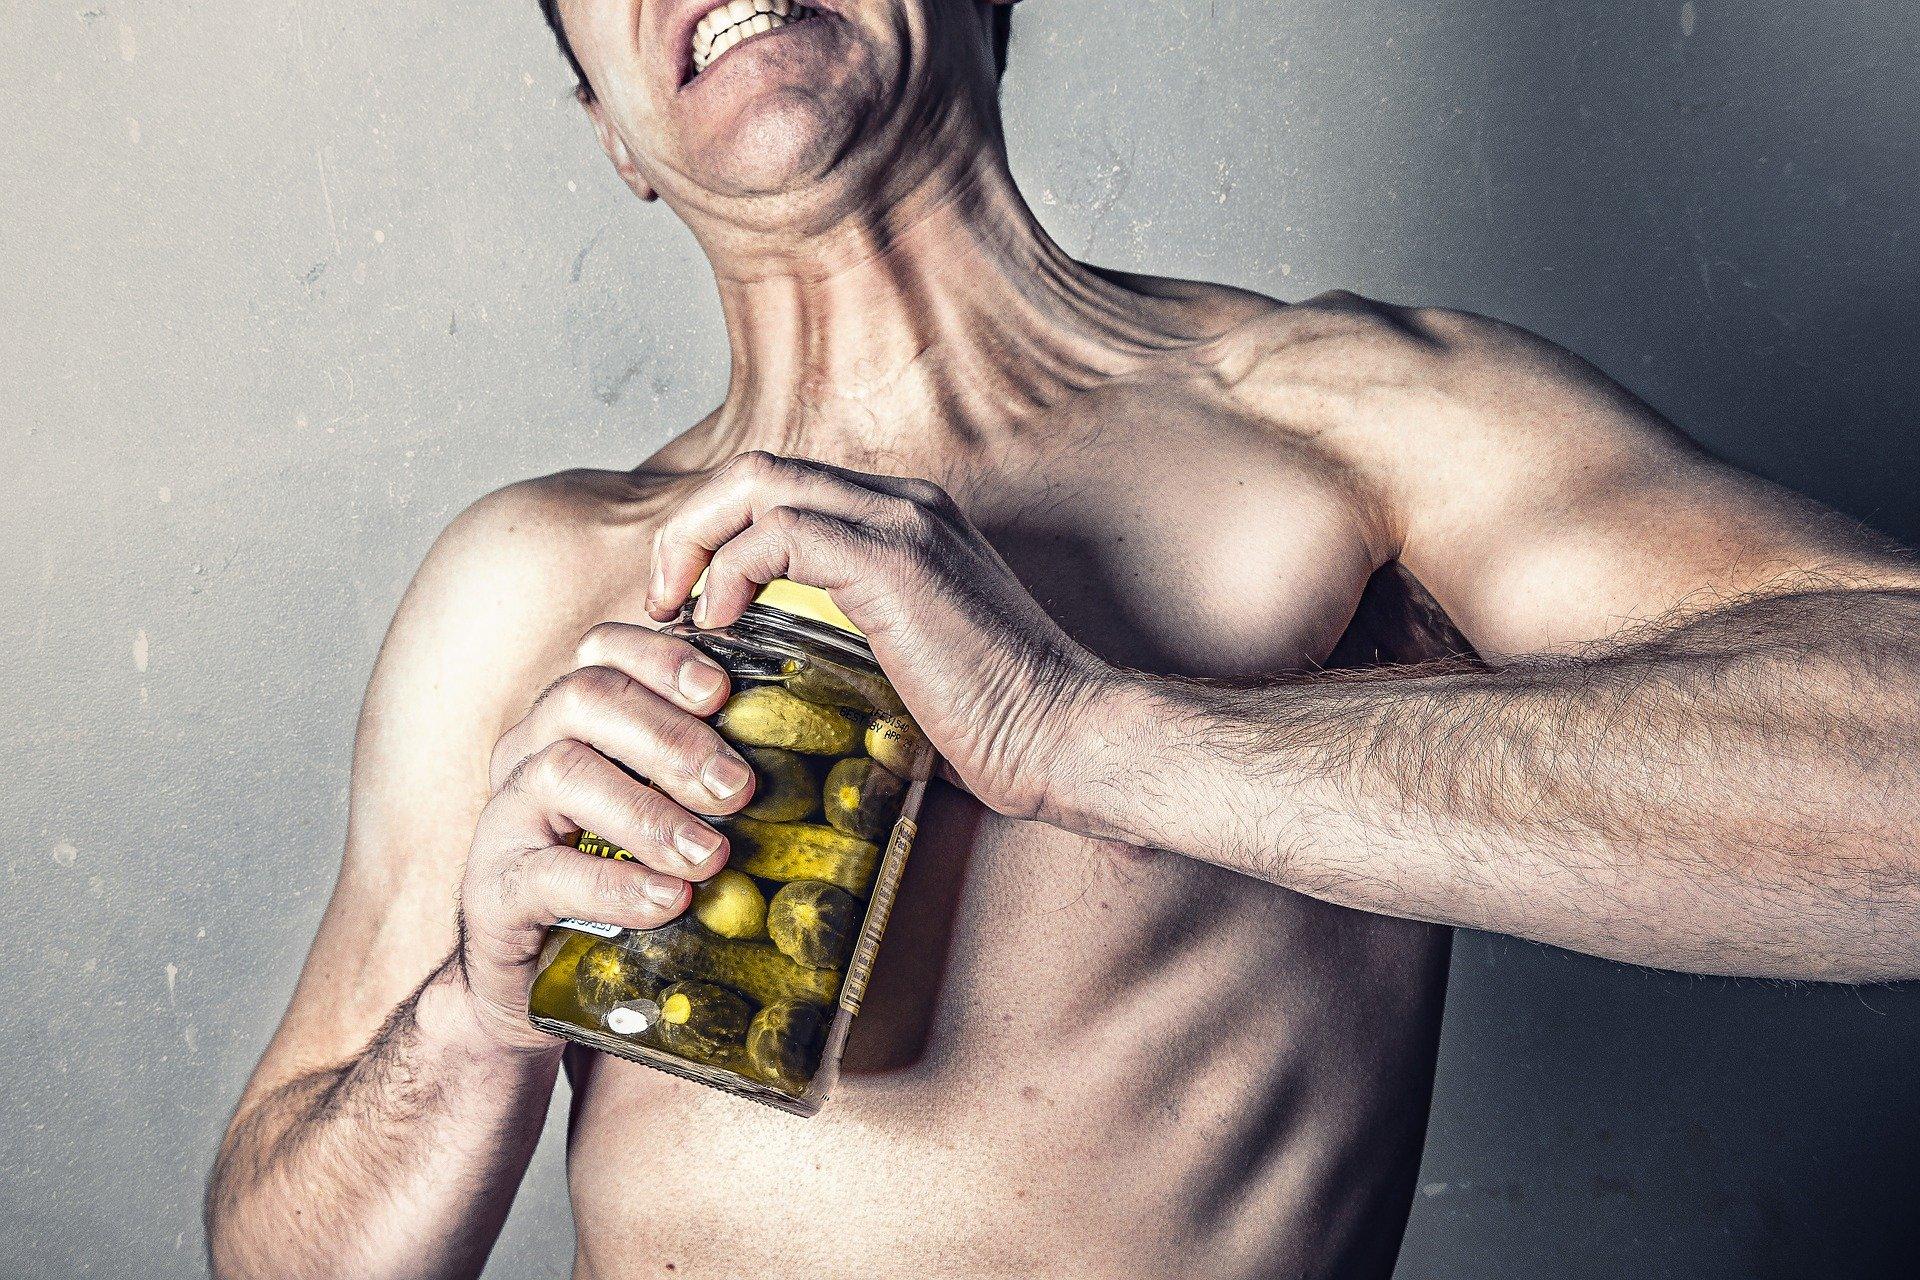 gezielt Muskulatur aufbauen?